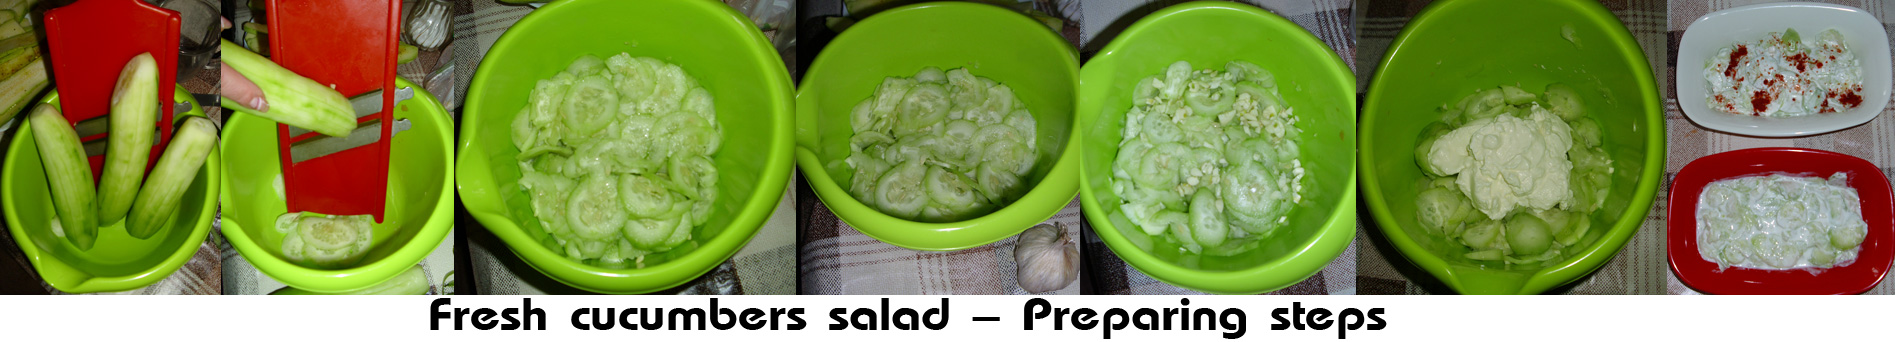 Fresh cucumbers salad prepare